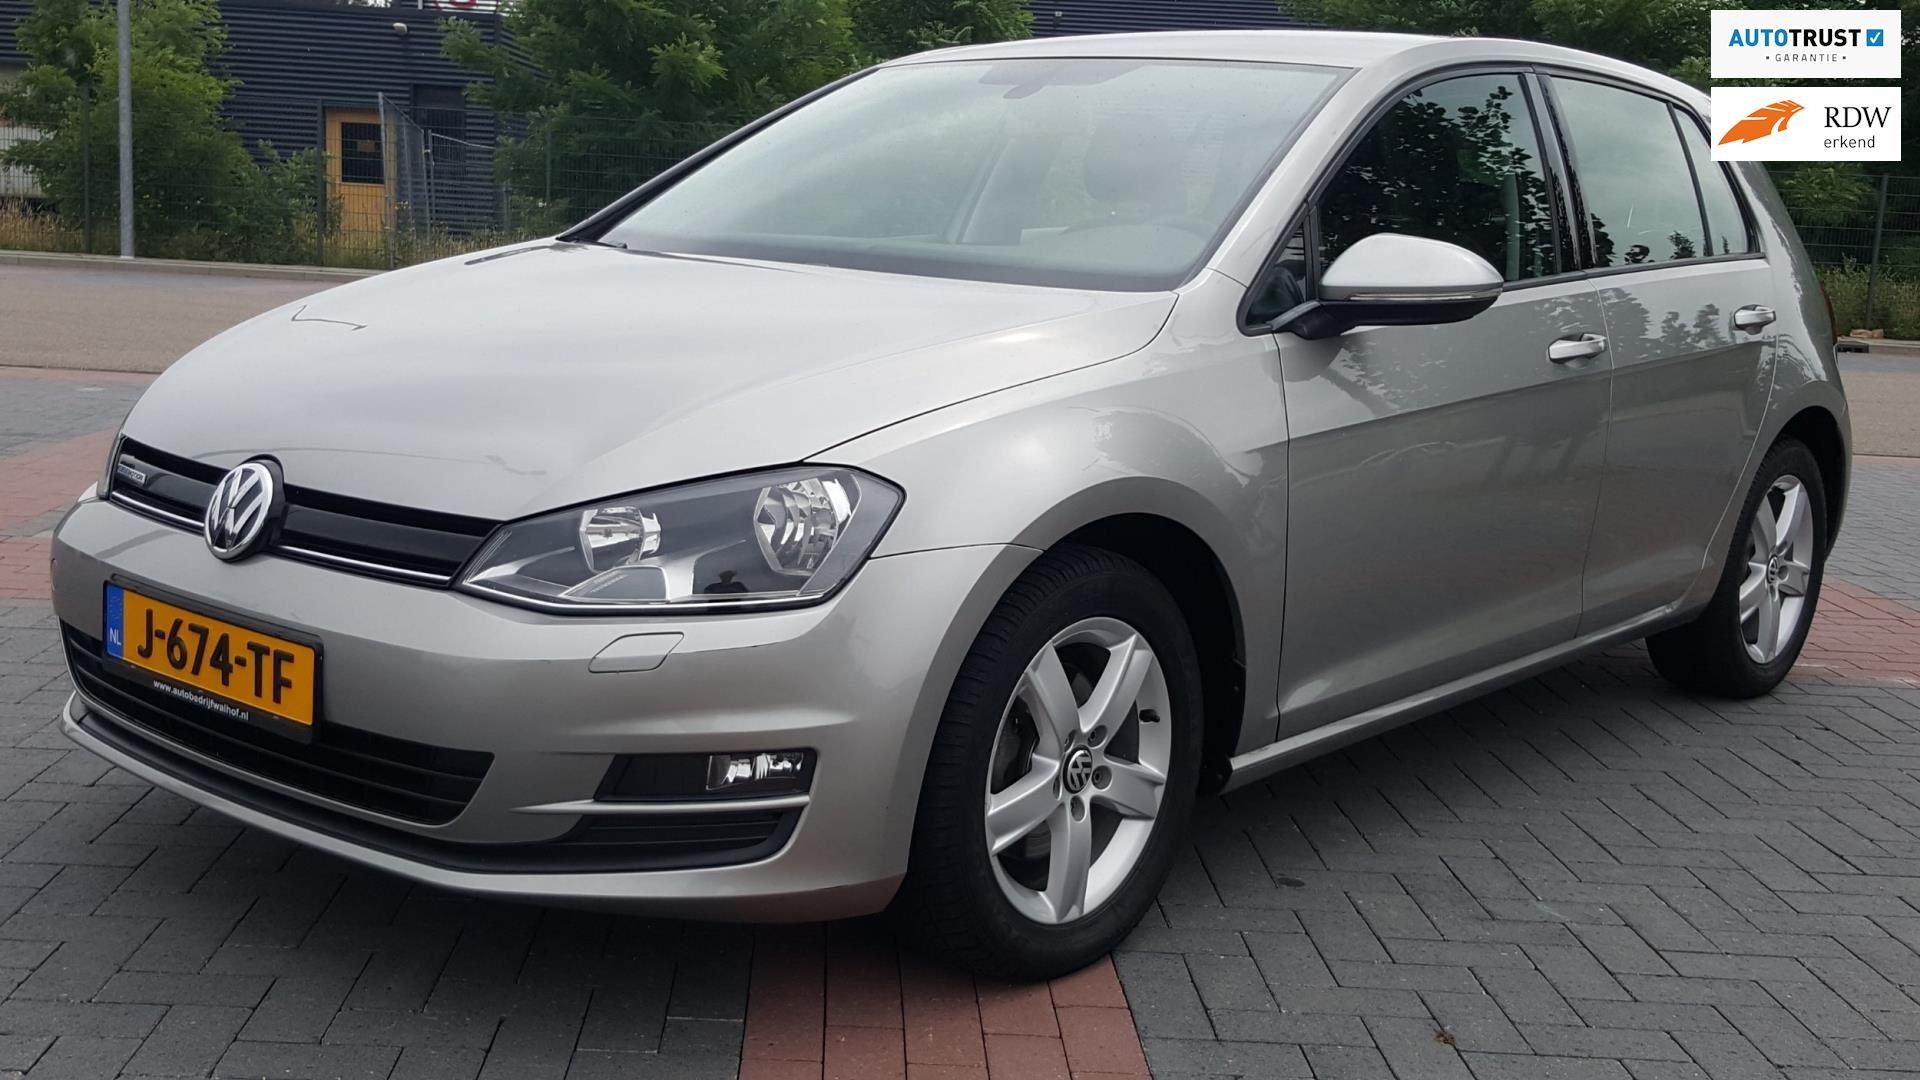 Volkswagen Golf occasion - Autobedrijf R. Walhof